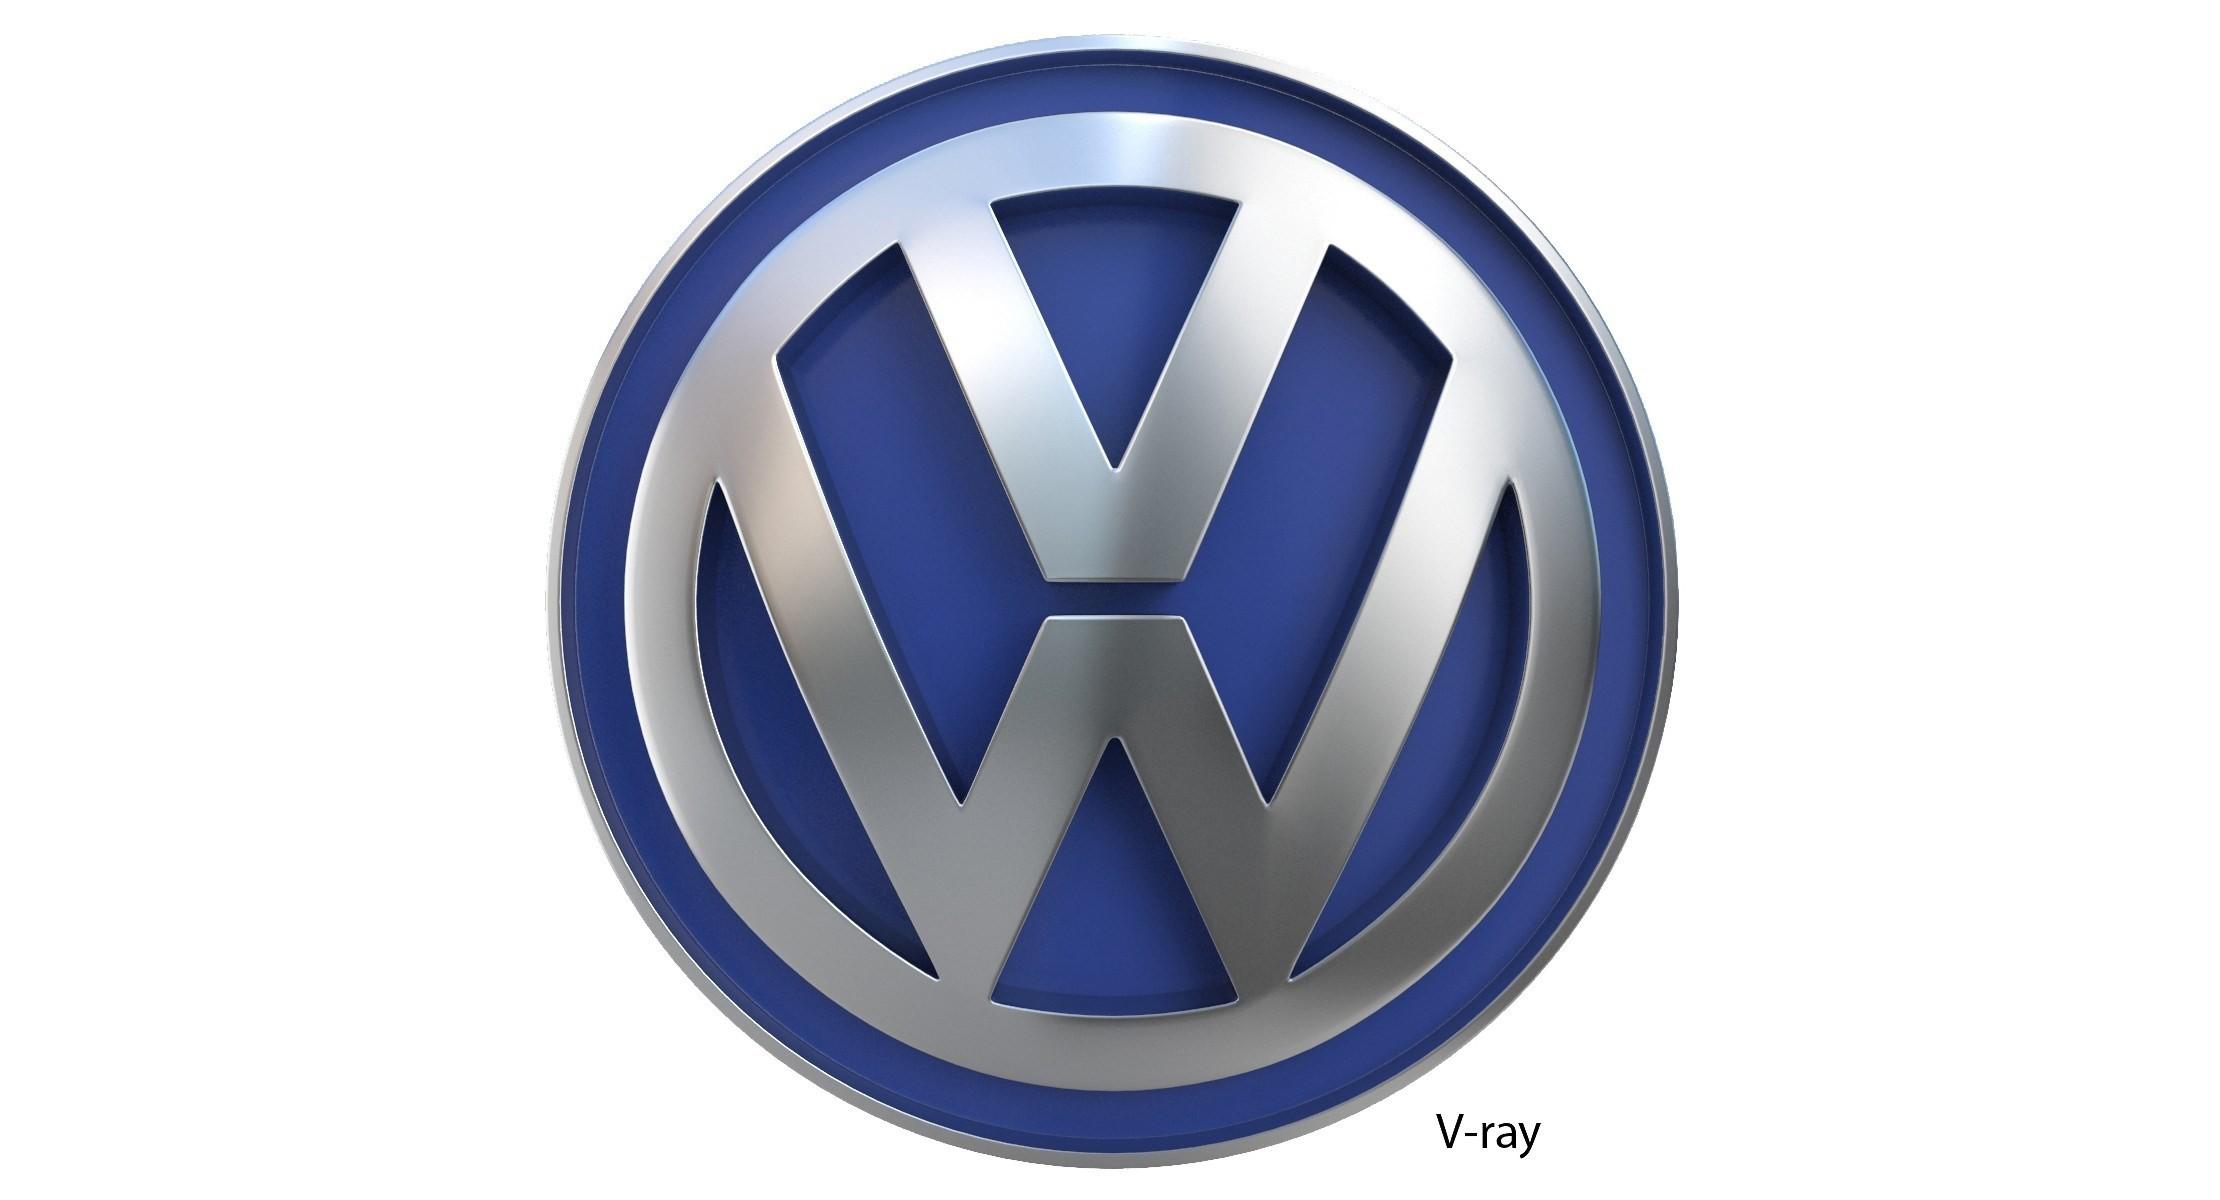 Lowrider Car Hd Wallpaper Volkswagen Logo Wallpaper 58 Images